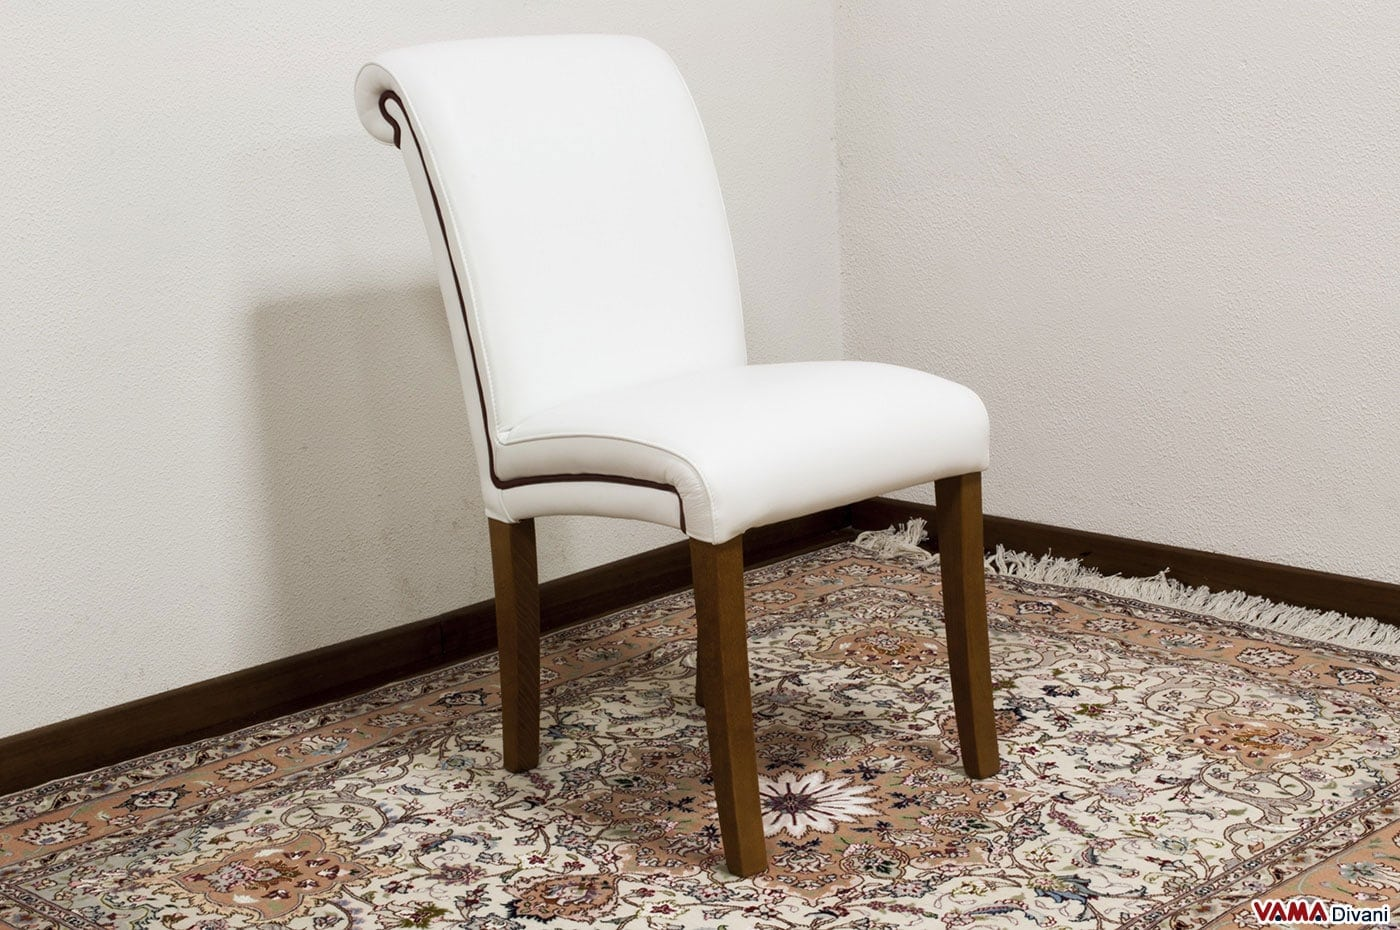 Sedia in pelle imbottita in stile classico for Sedie da soggiorno in pelle